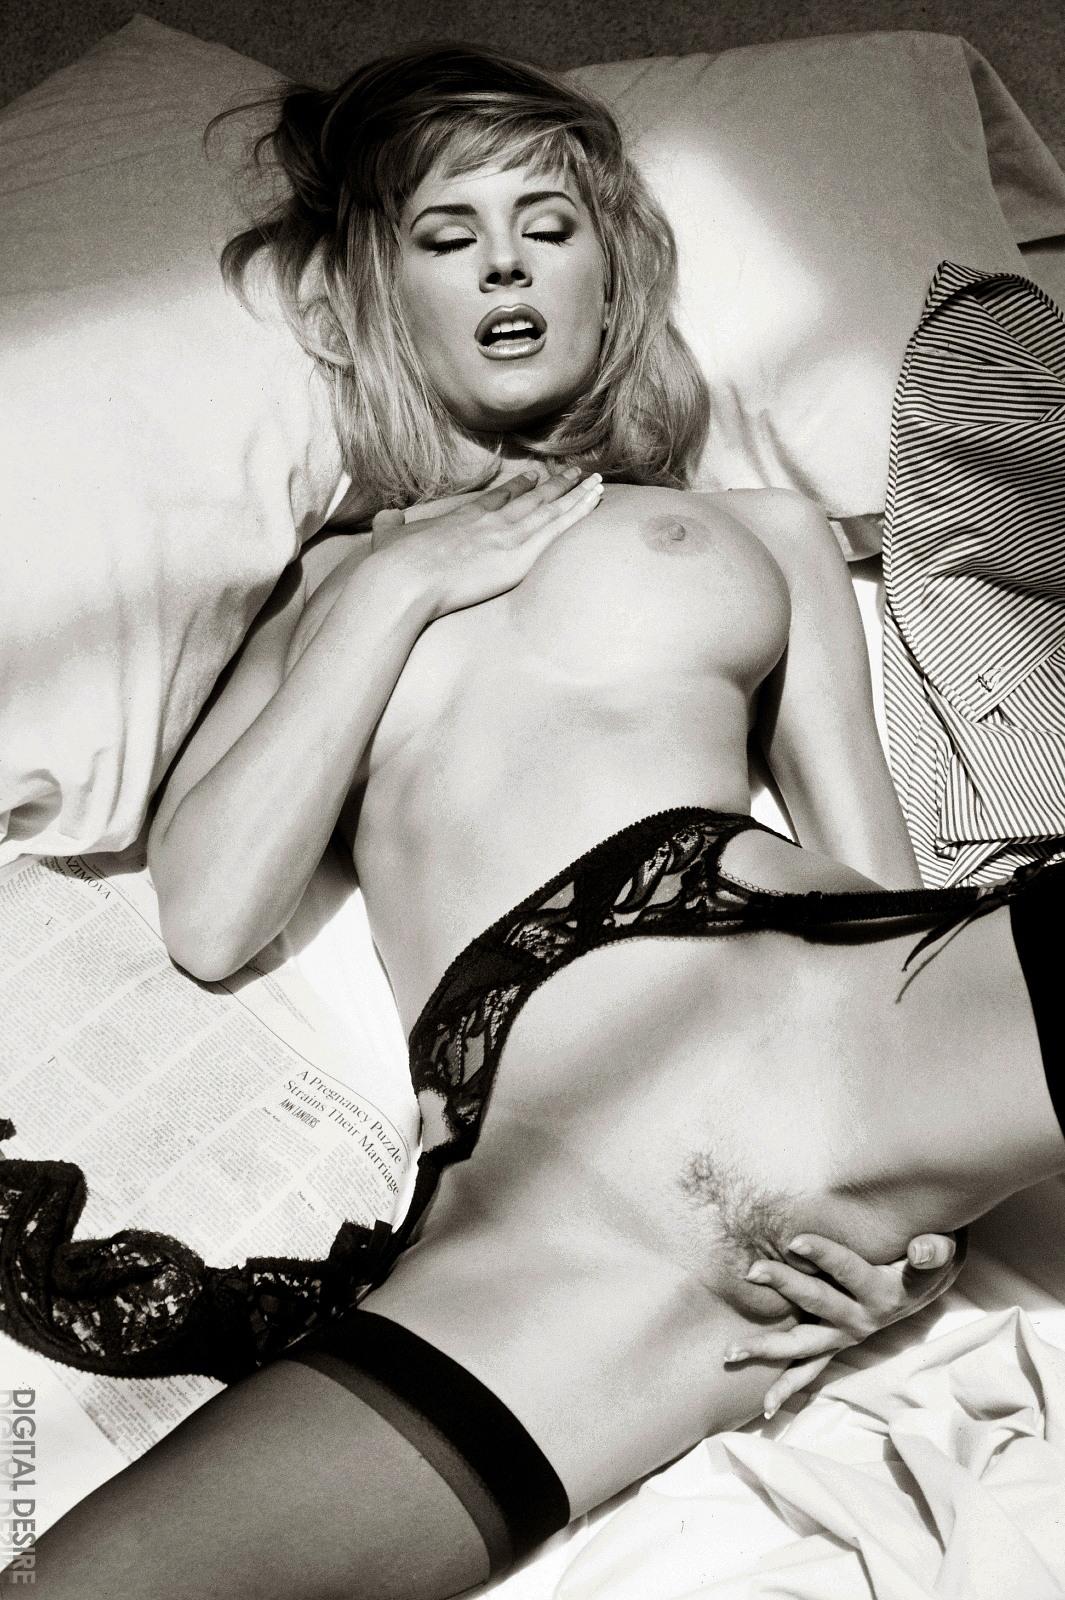 Секс знаменитная артистка фото 436-66